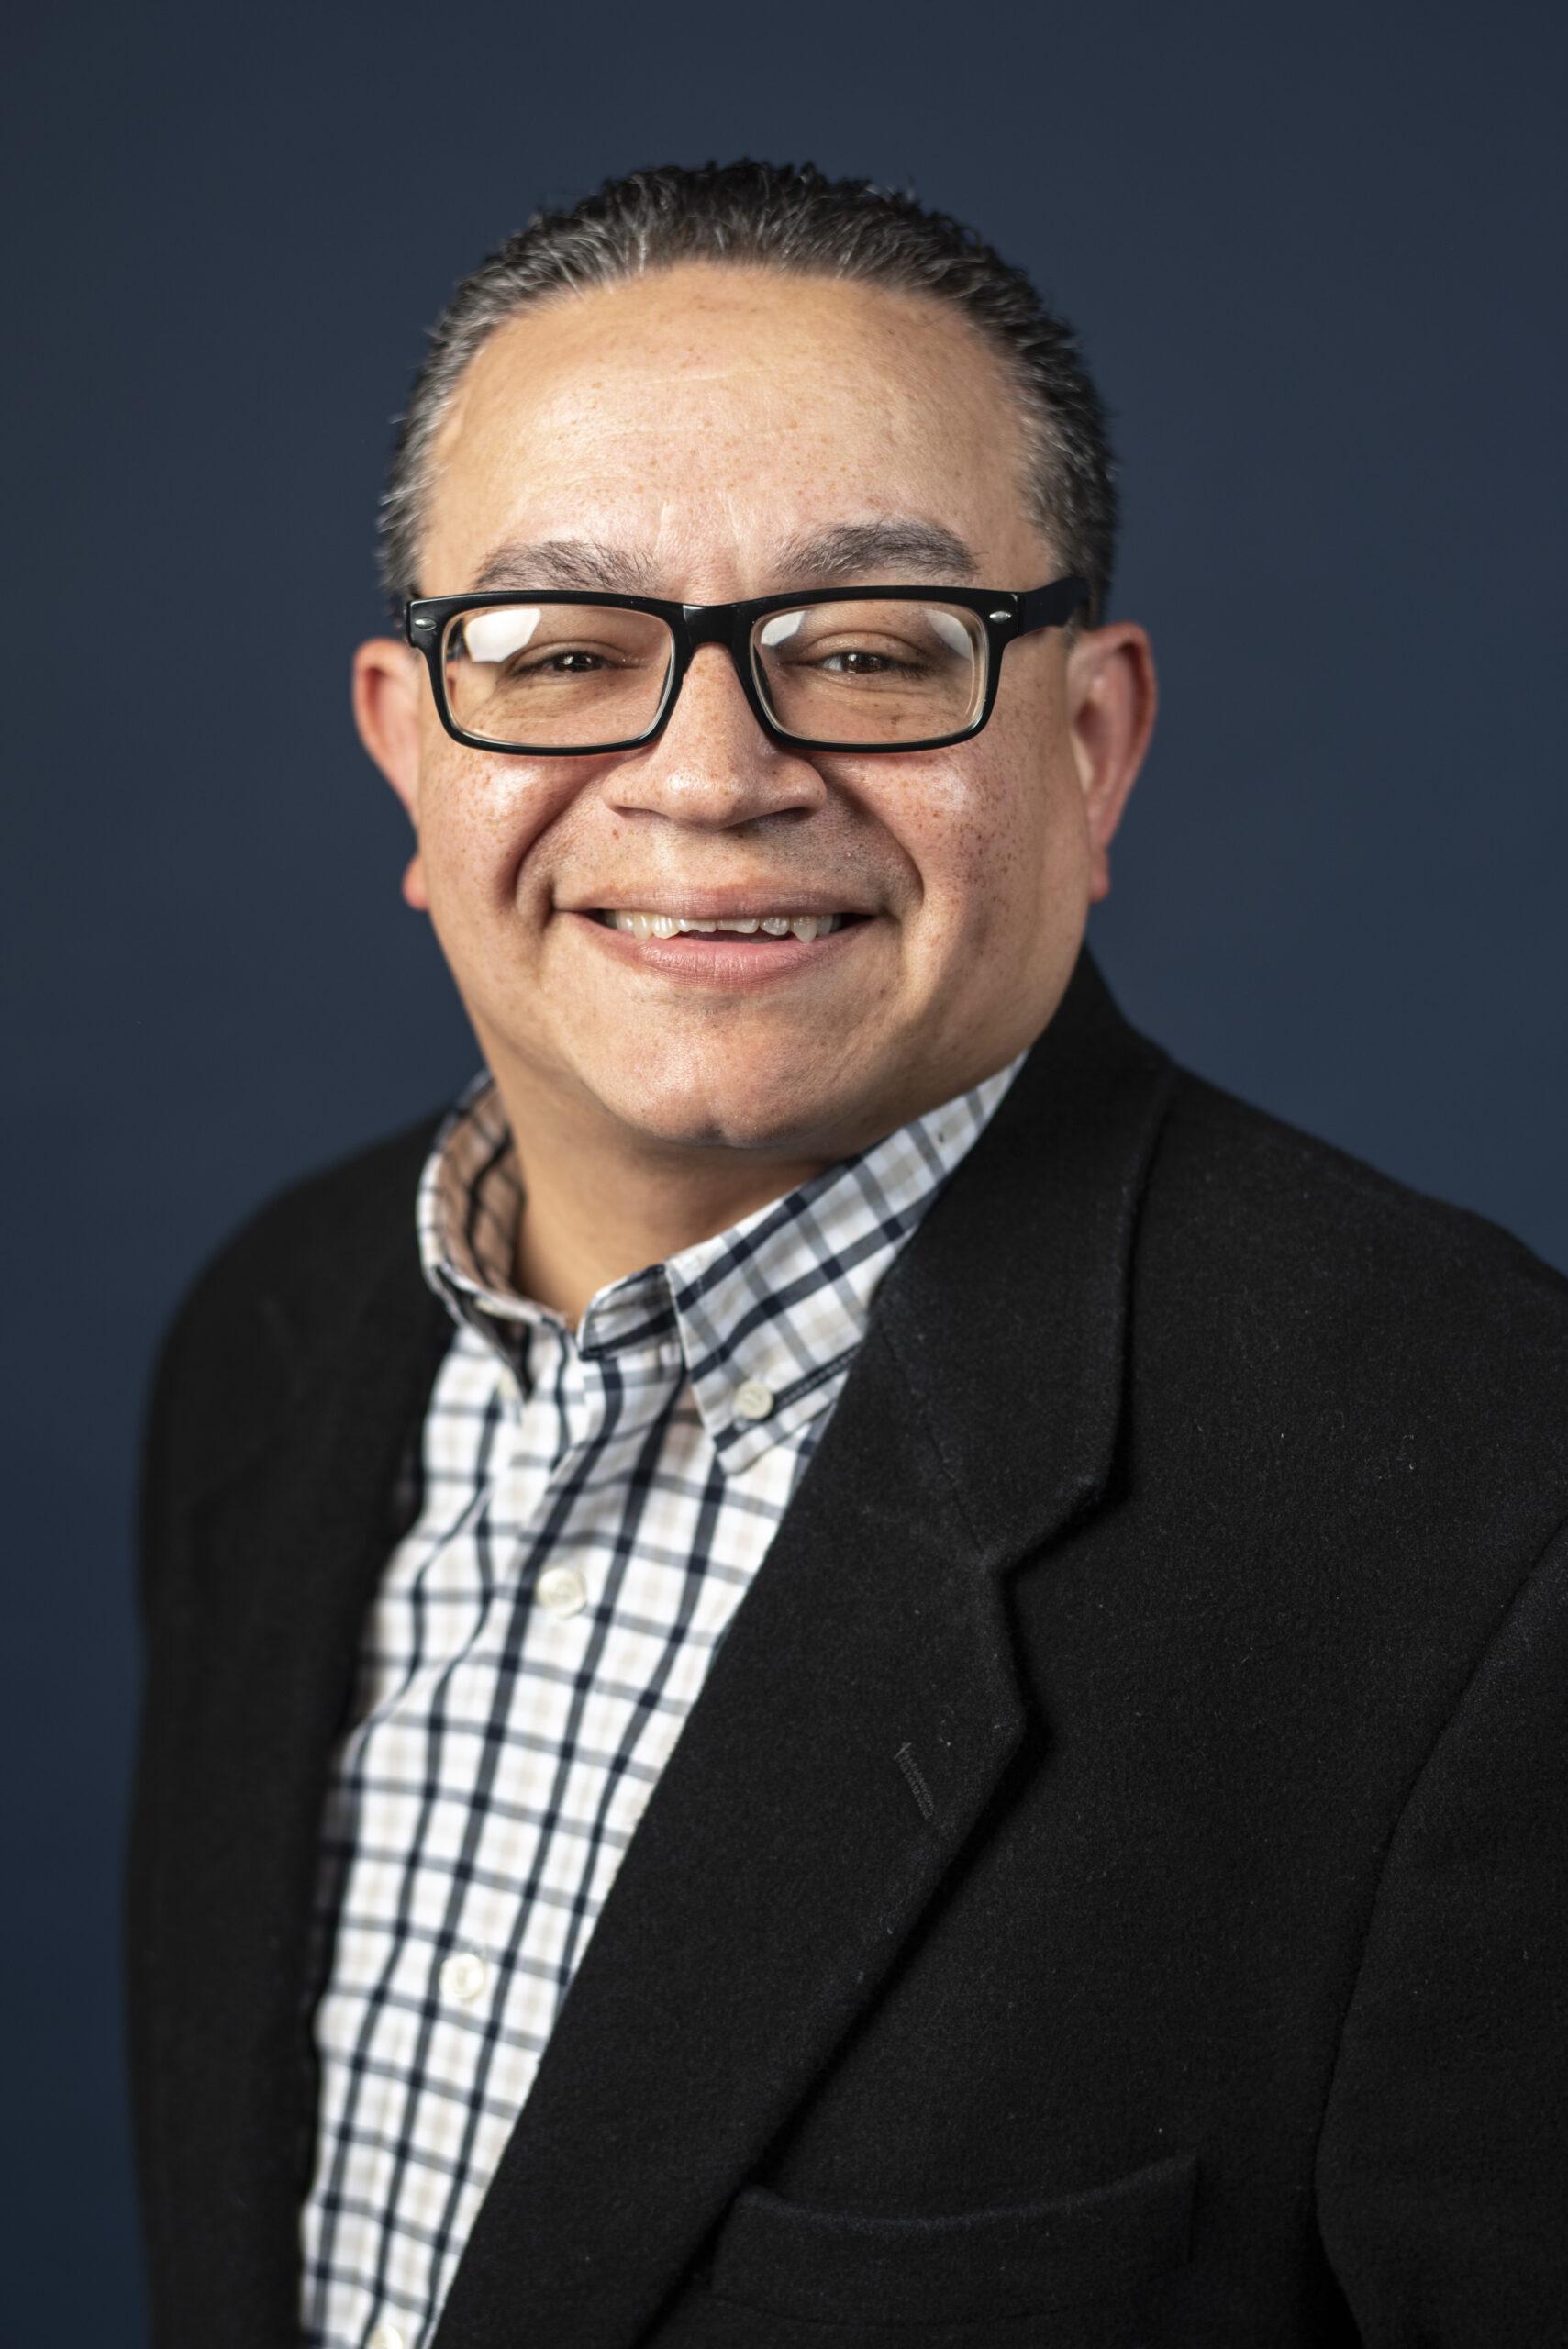 man in black glasses, blue plaid dress shirt and black jacket